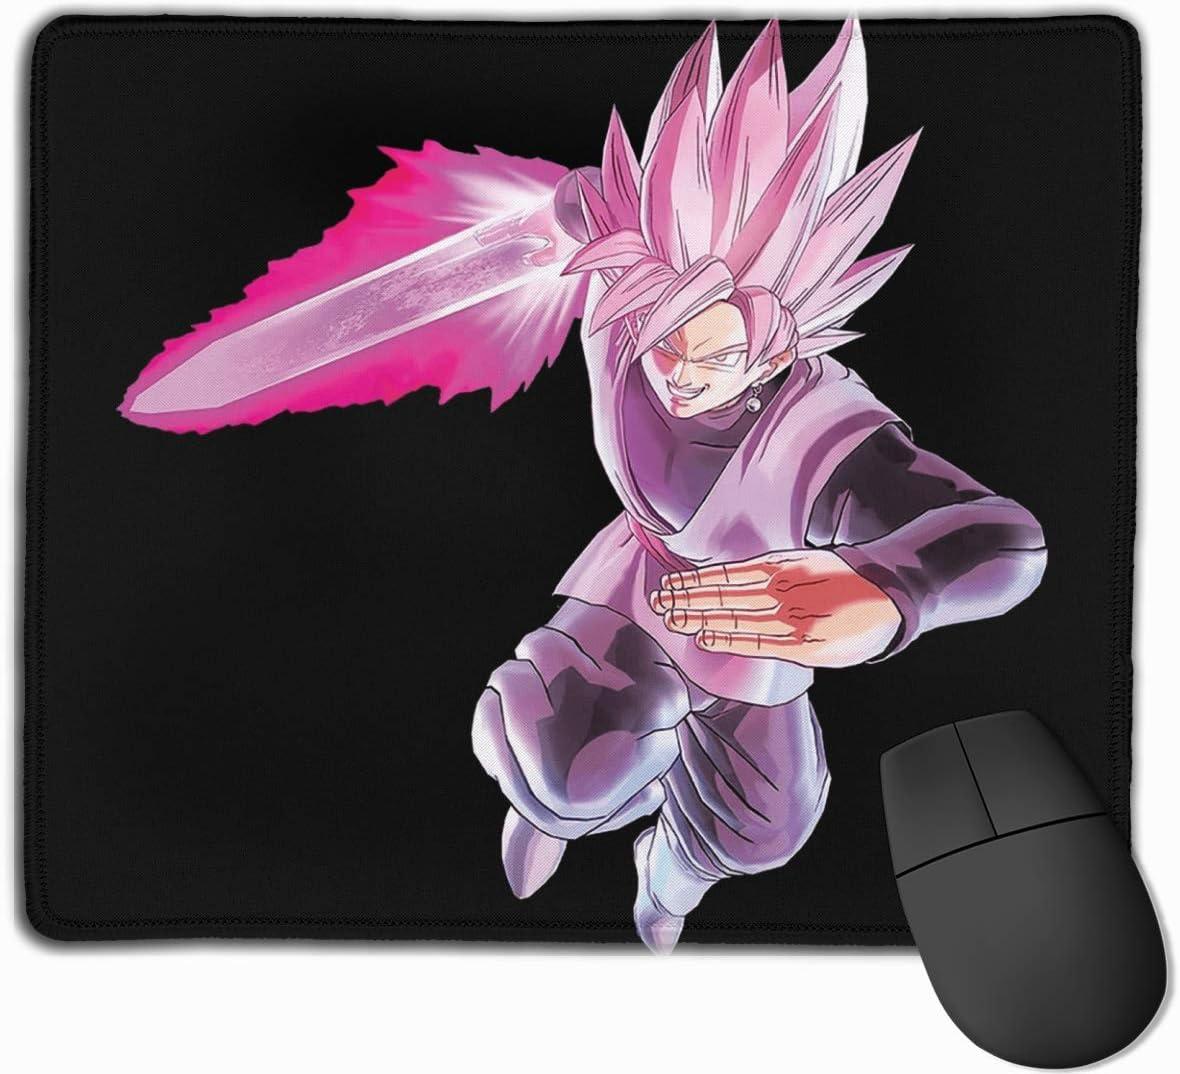 Mouse Pad Gaming Dragon Ball Super Goku Black Rose Computer Laptop Mousepad Cosido Edge Gaming Mouse Pad